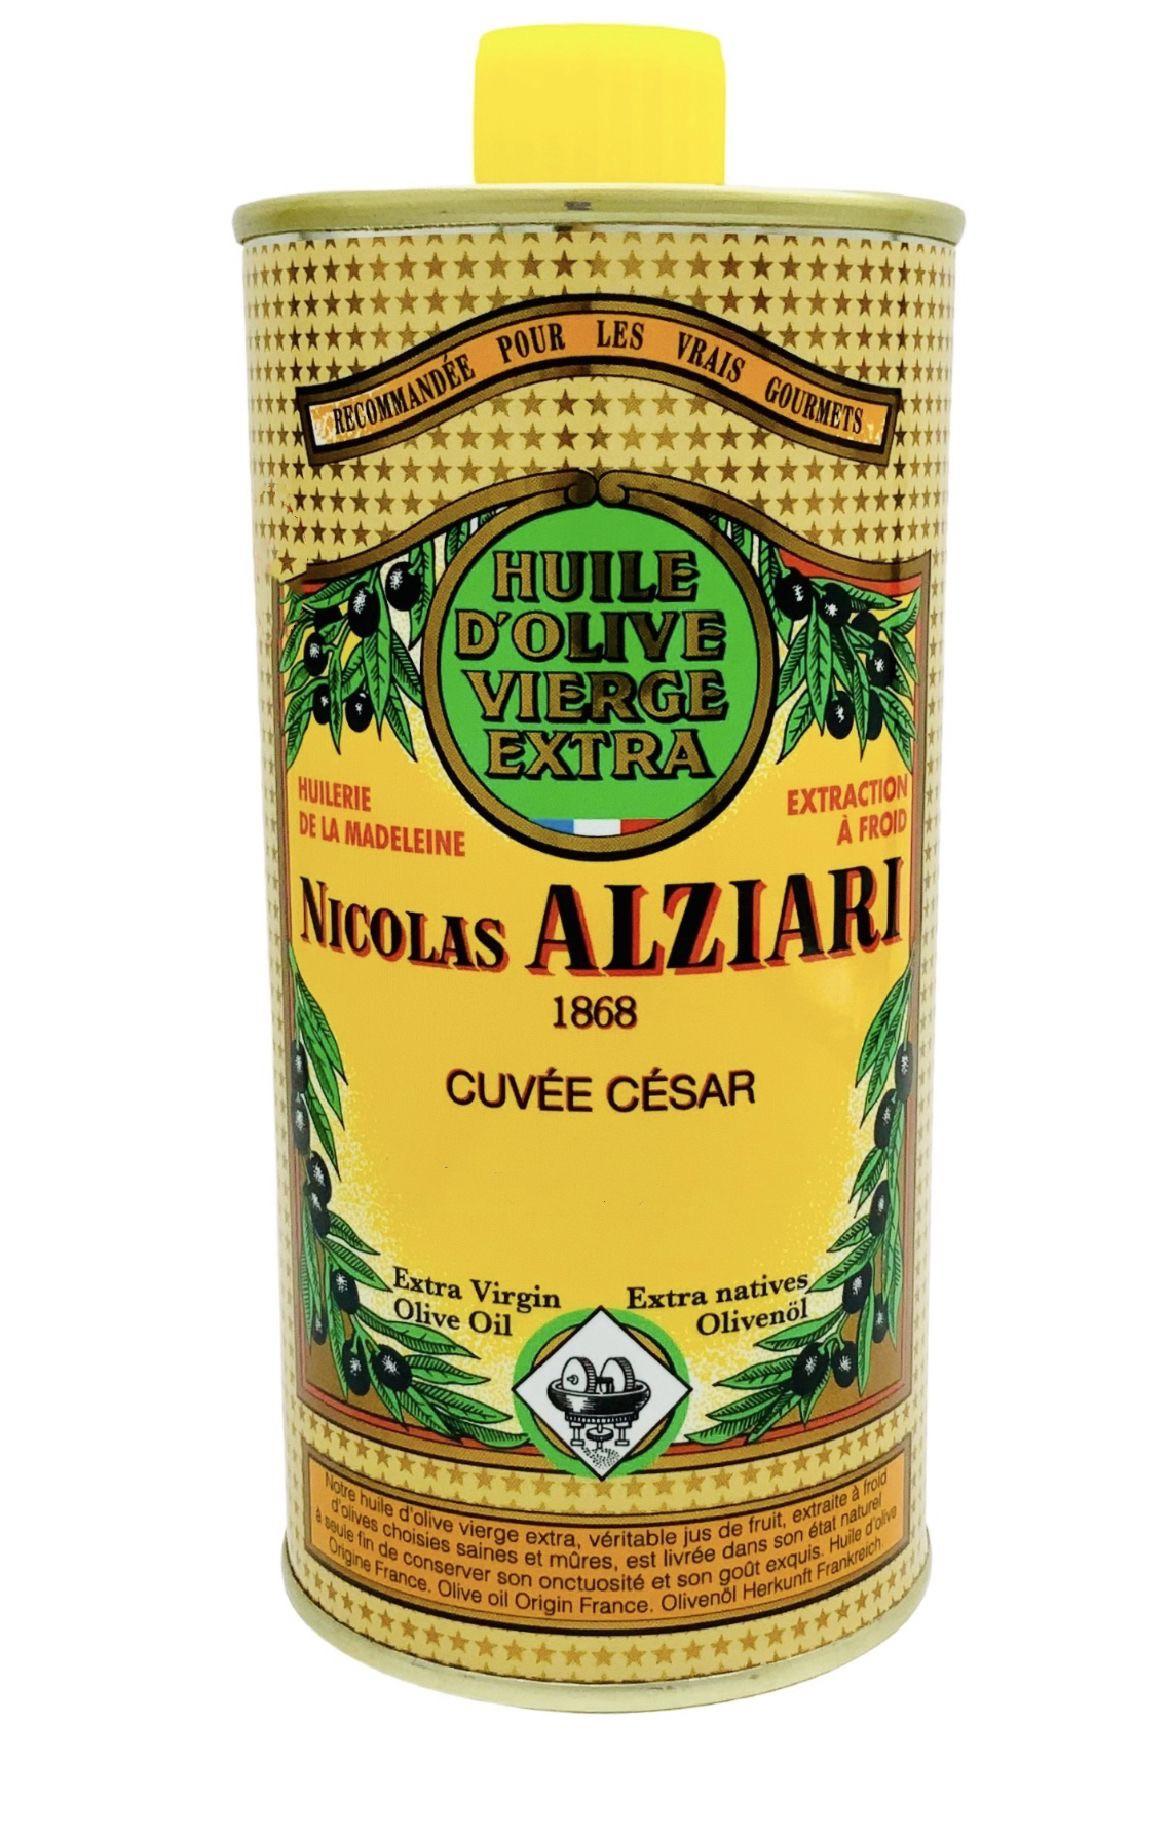 OLIVE OIL NICOLAS ALZIARI CUVÉE CESAR 500 ML